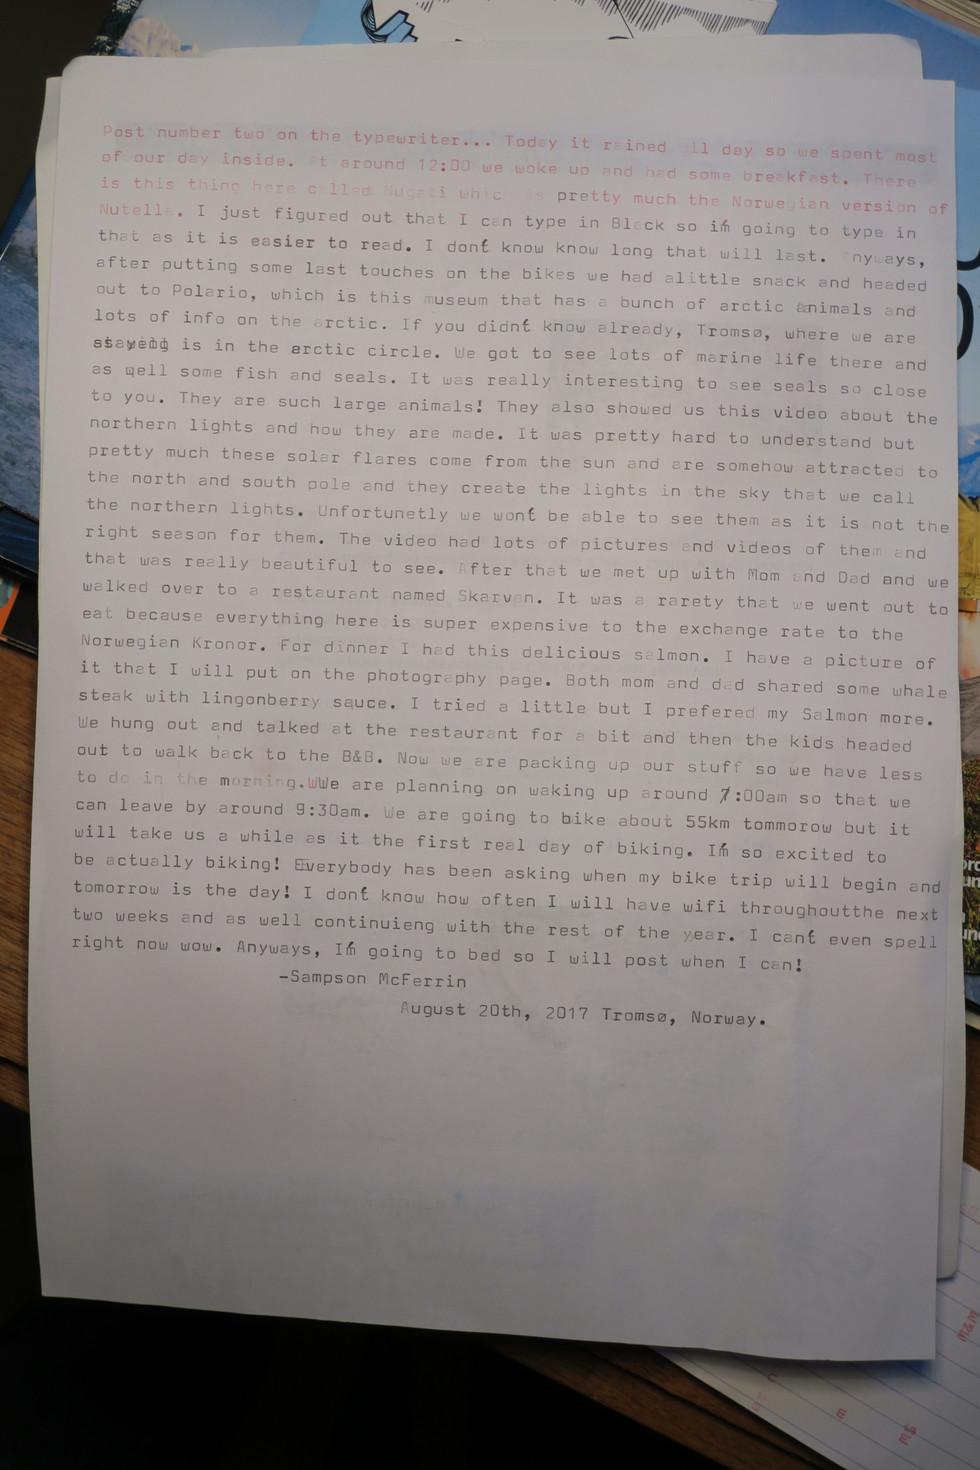 Last post on the typewriter